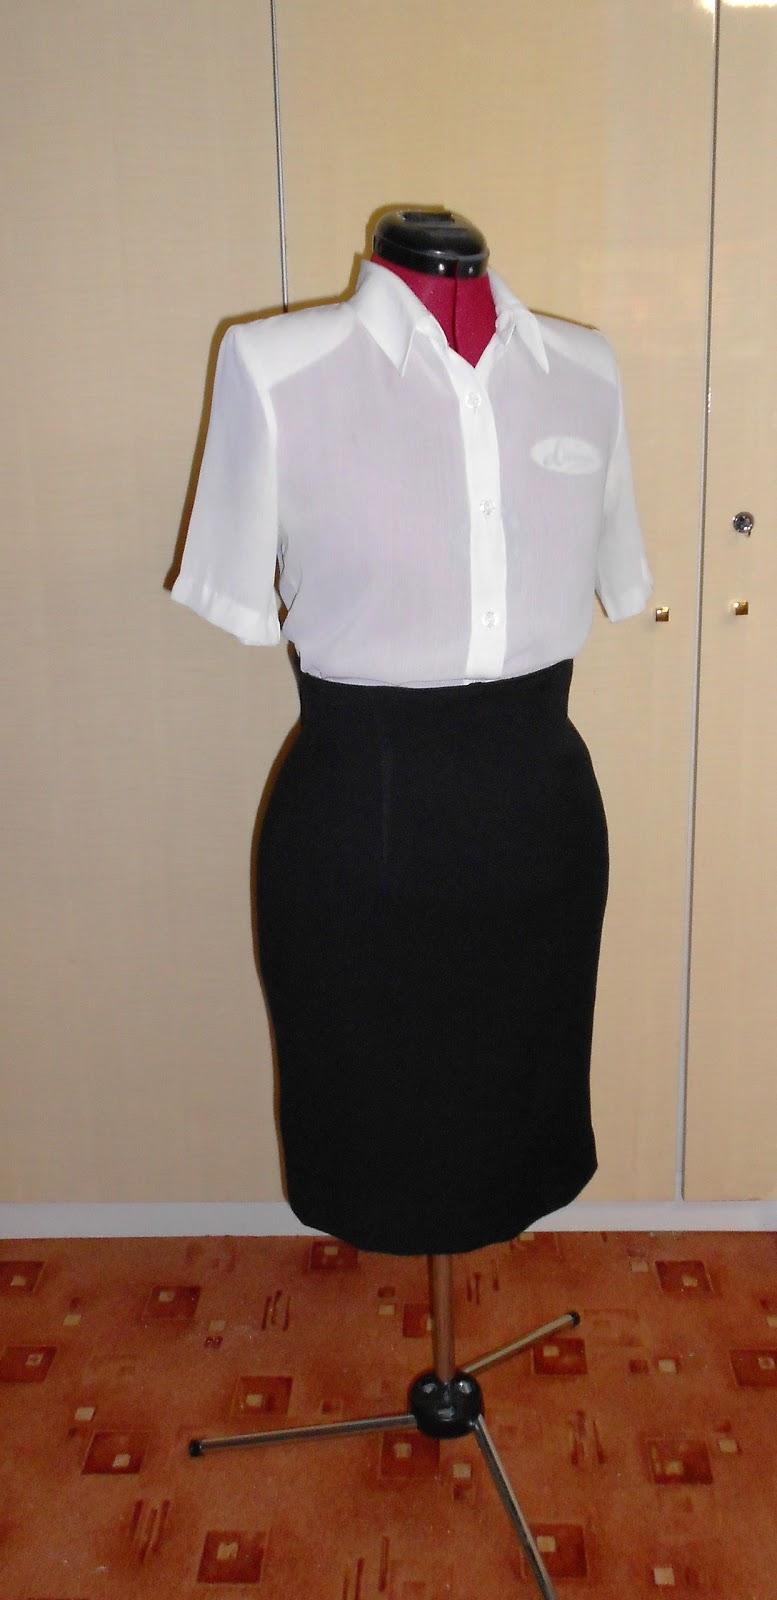 5f43d58e4 Cómo estrenar ropa vieja?: Falda negra en falda de talle alto